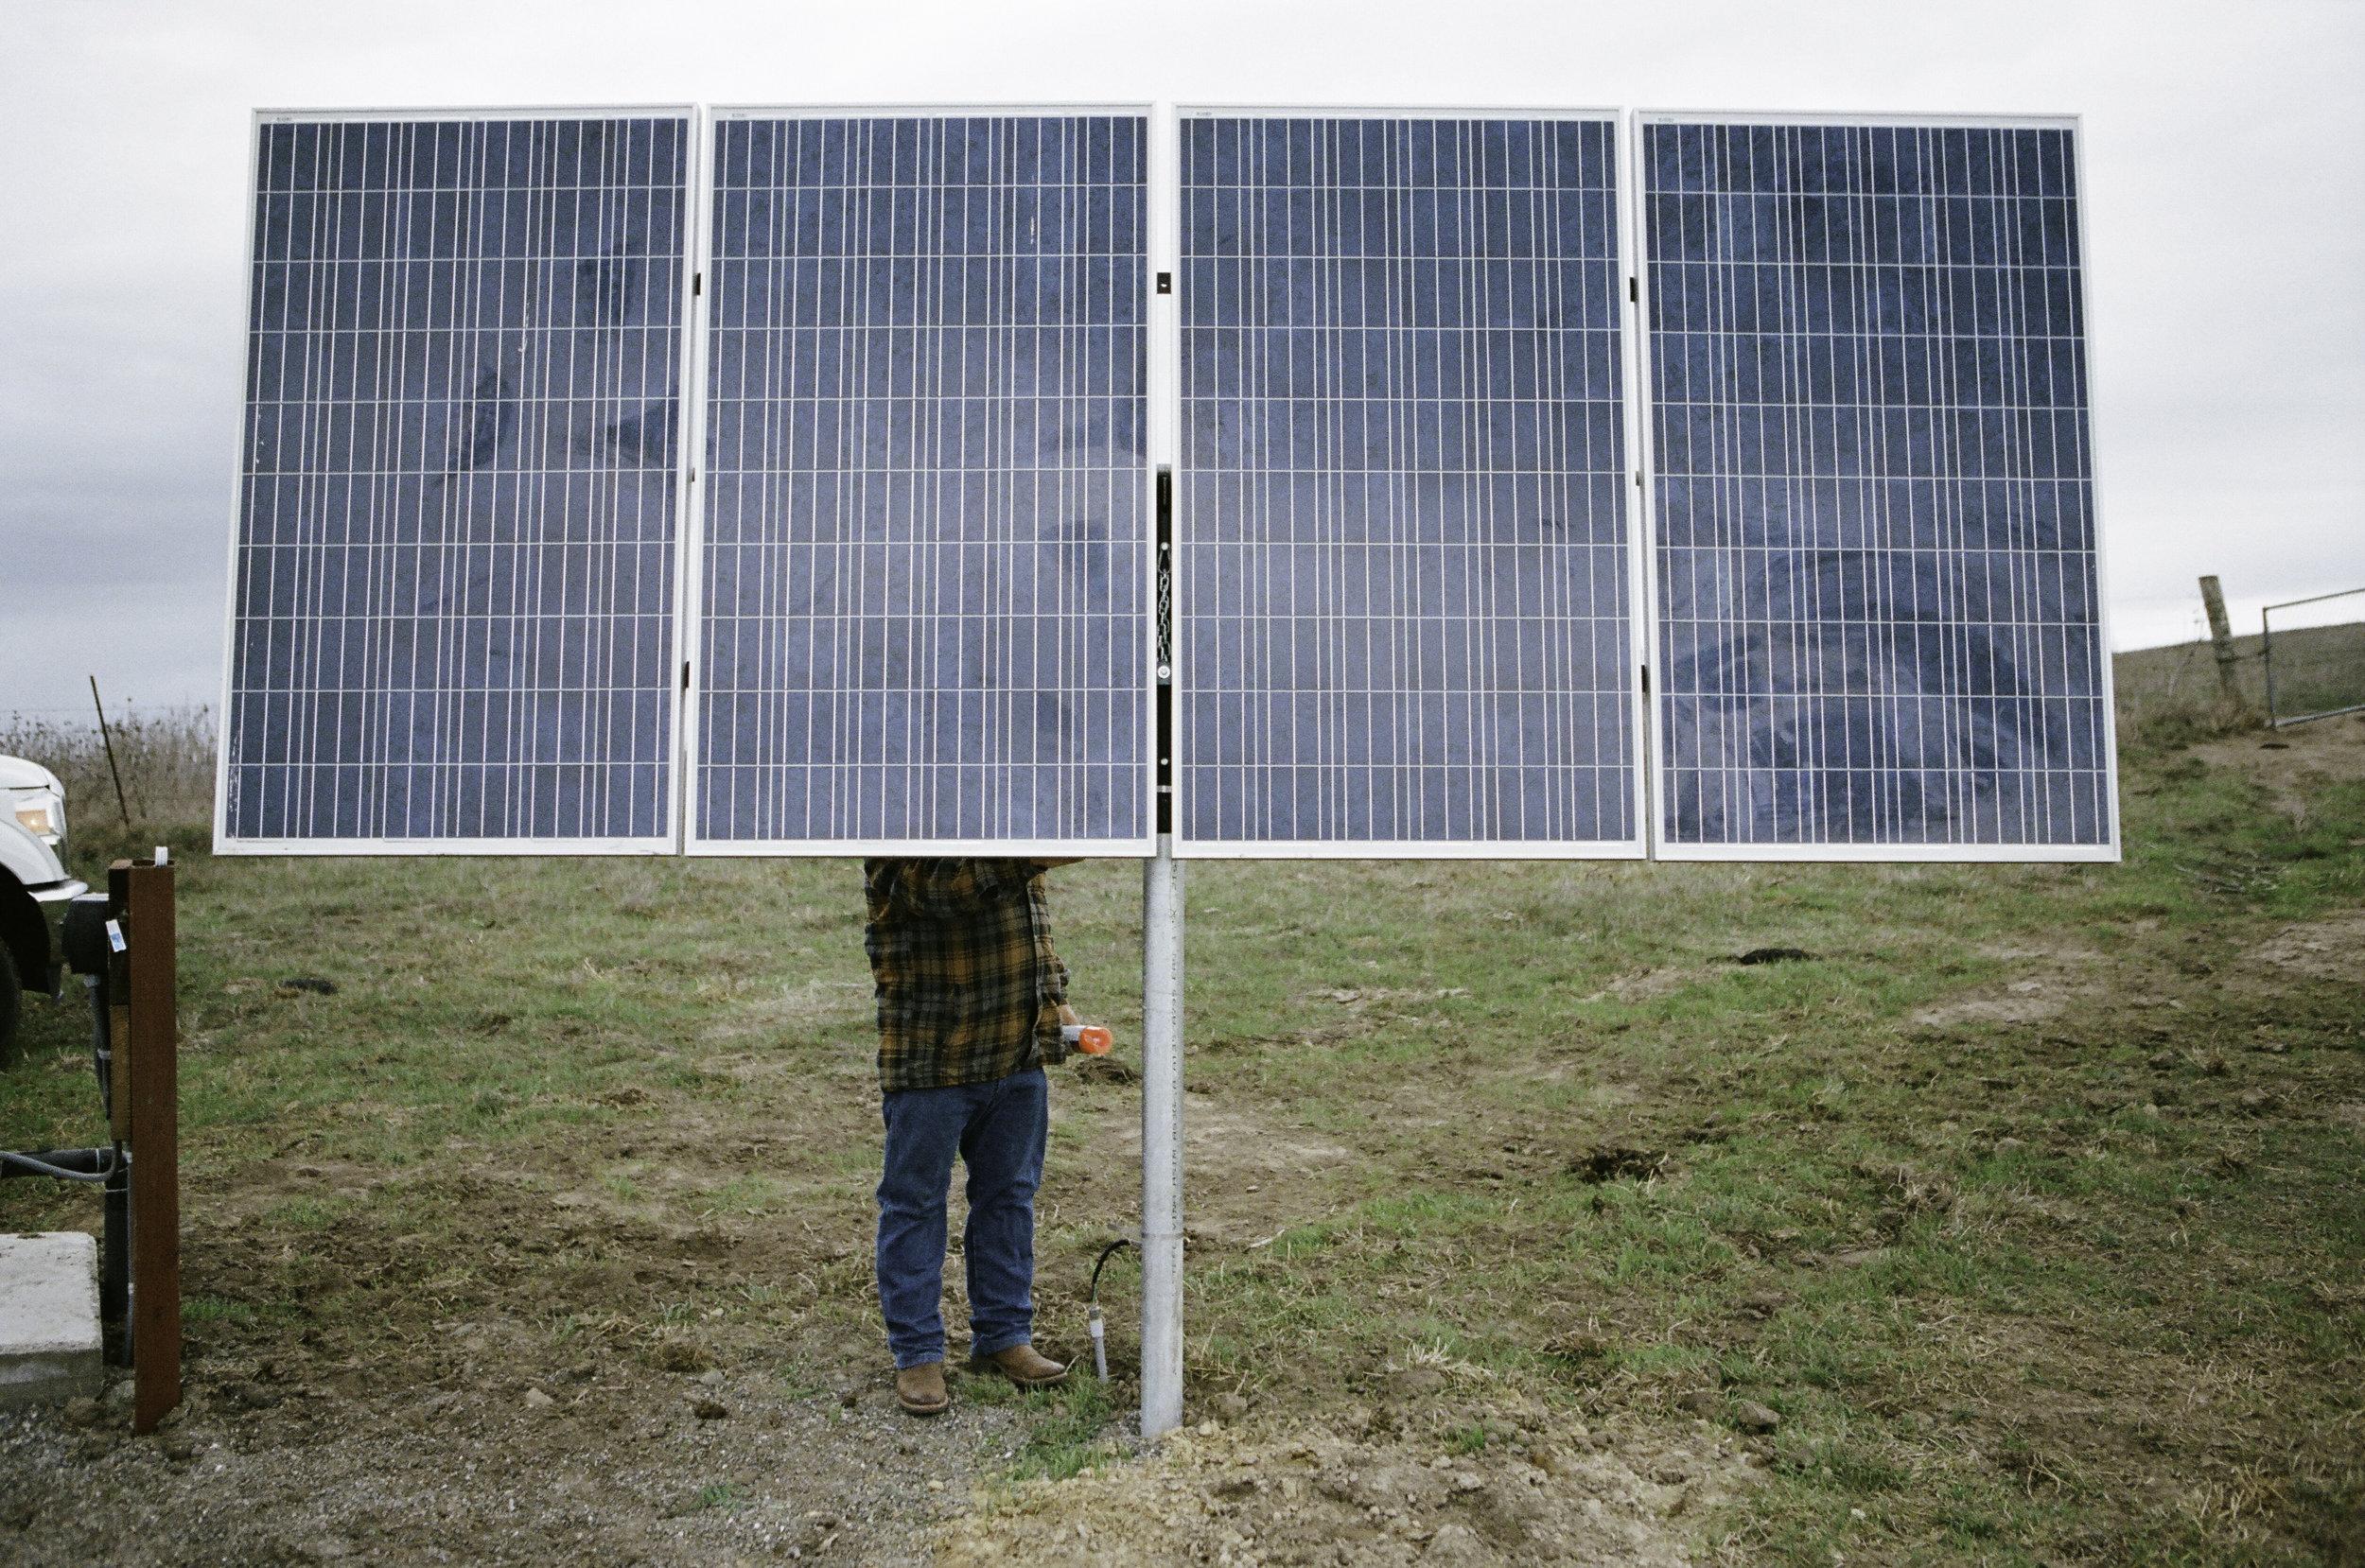 Loren reangling his newly installed solar panels that power his water pumps. - Petaluma, CA